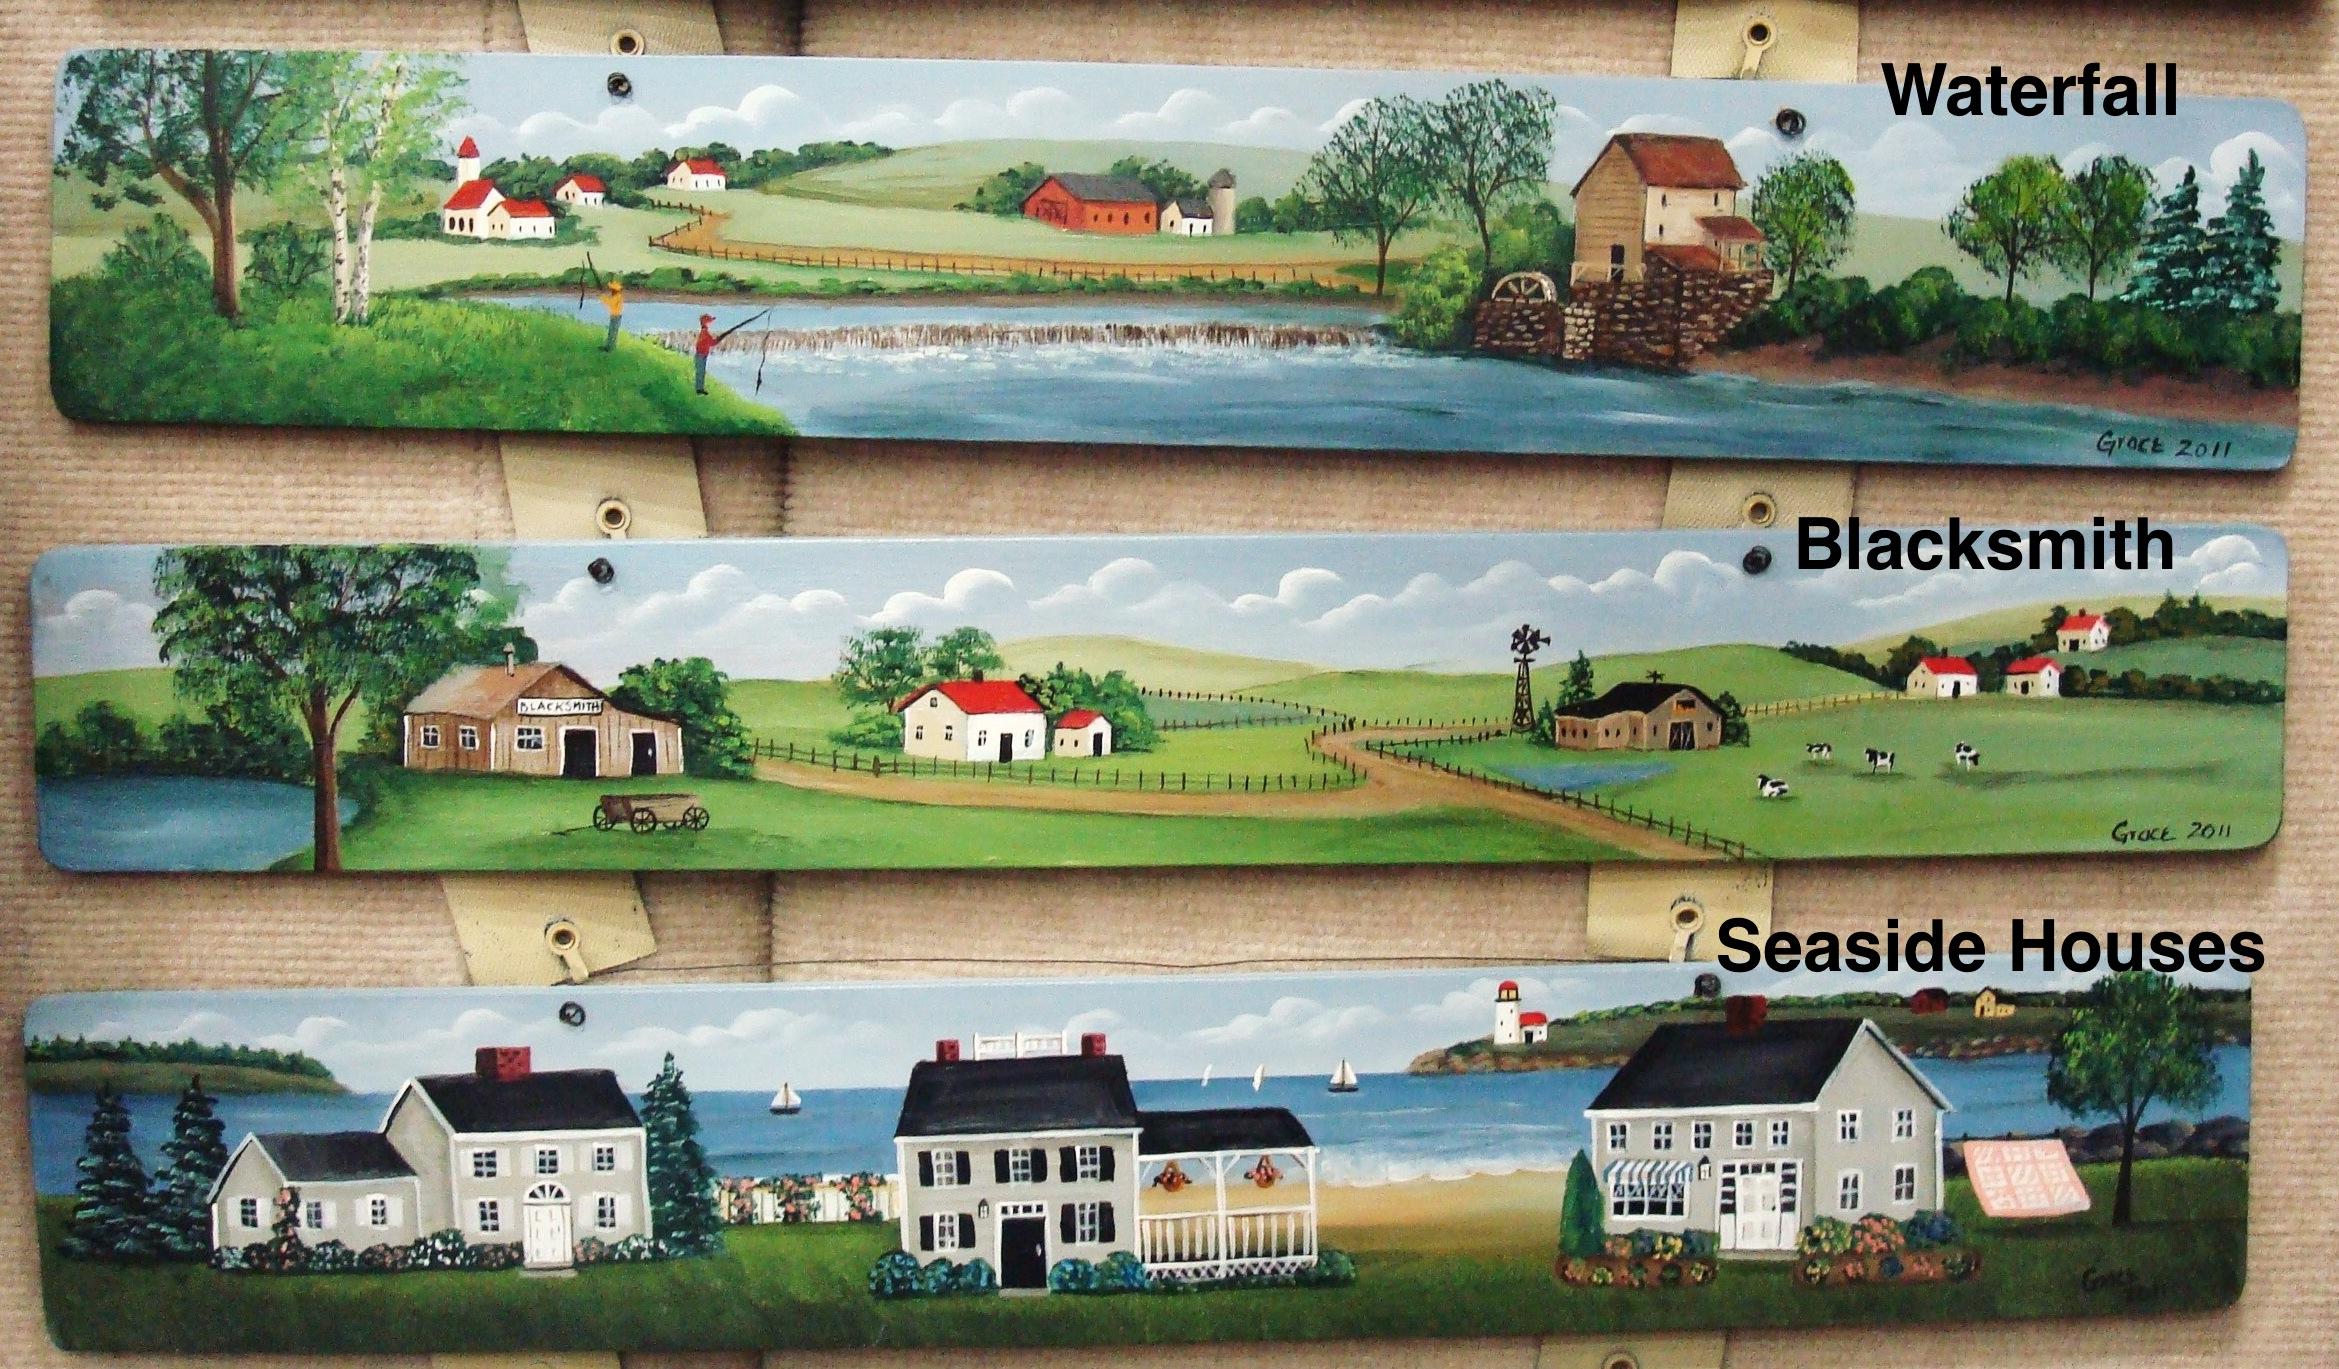 Waterfall / Blacksmith / Seaside Houses